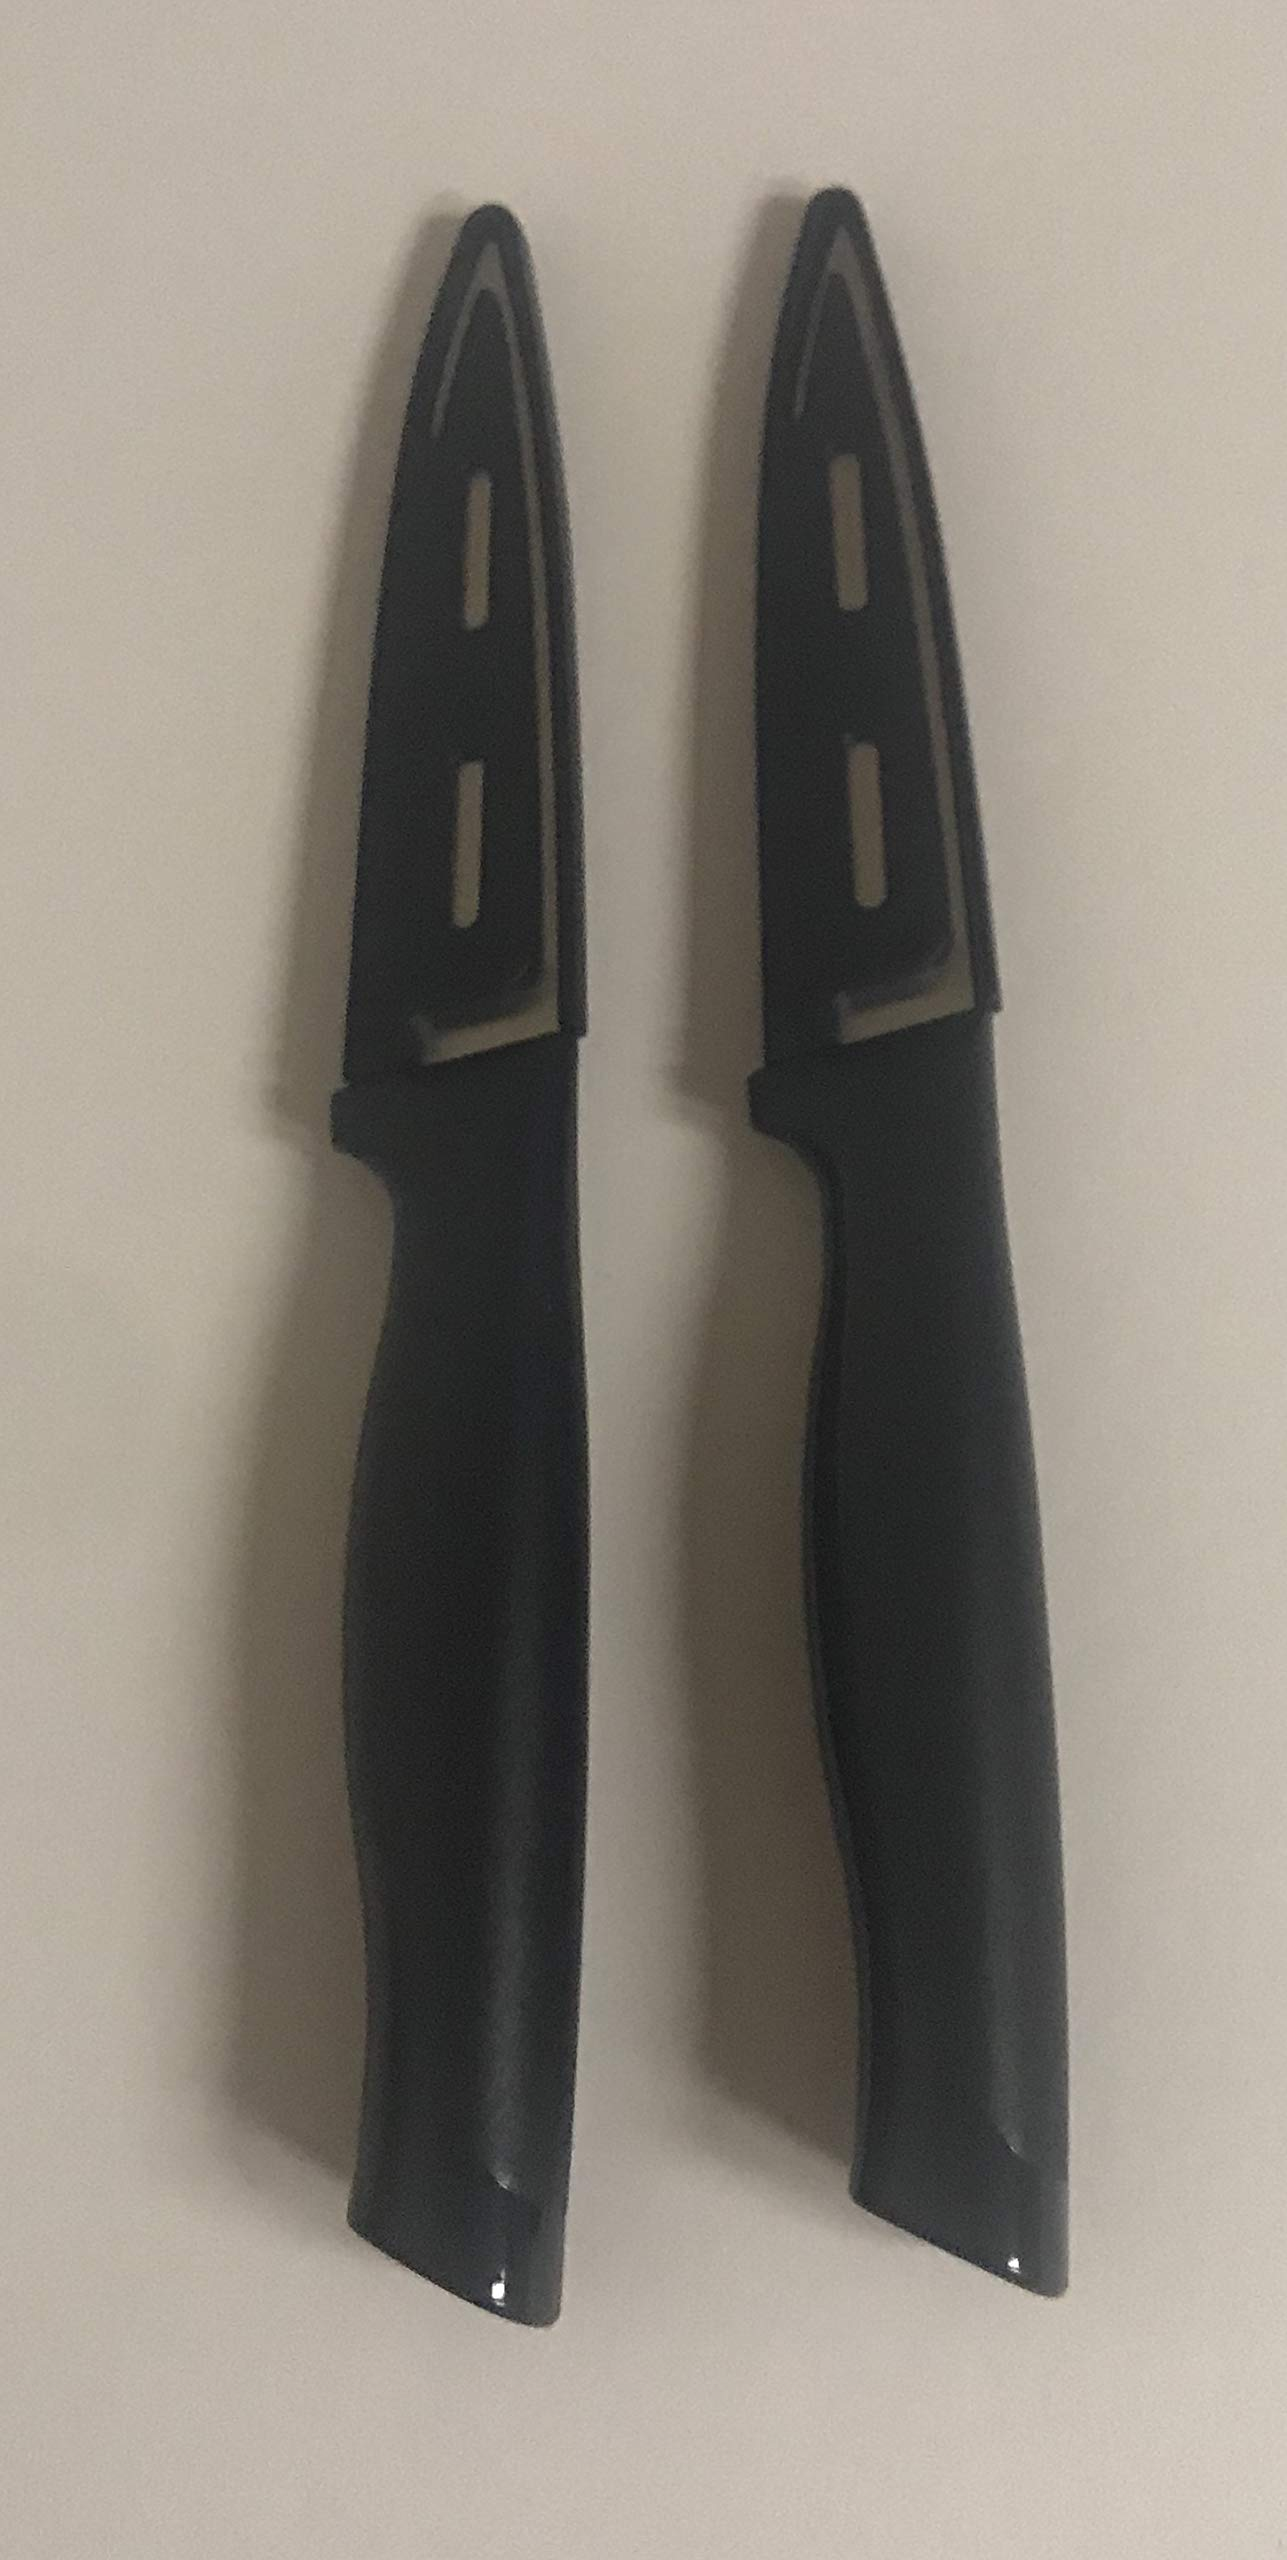 Tupperware 3 1/2'' Paring Knife, Set of 2